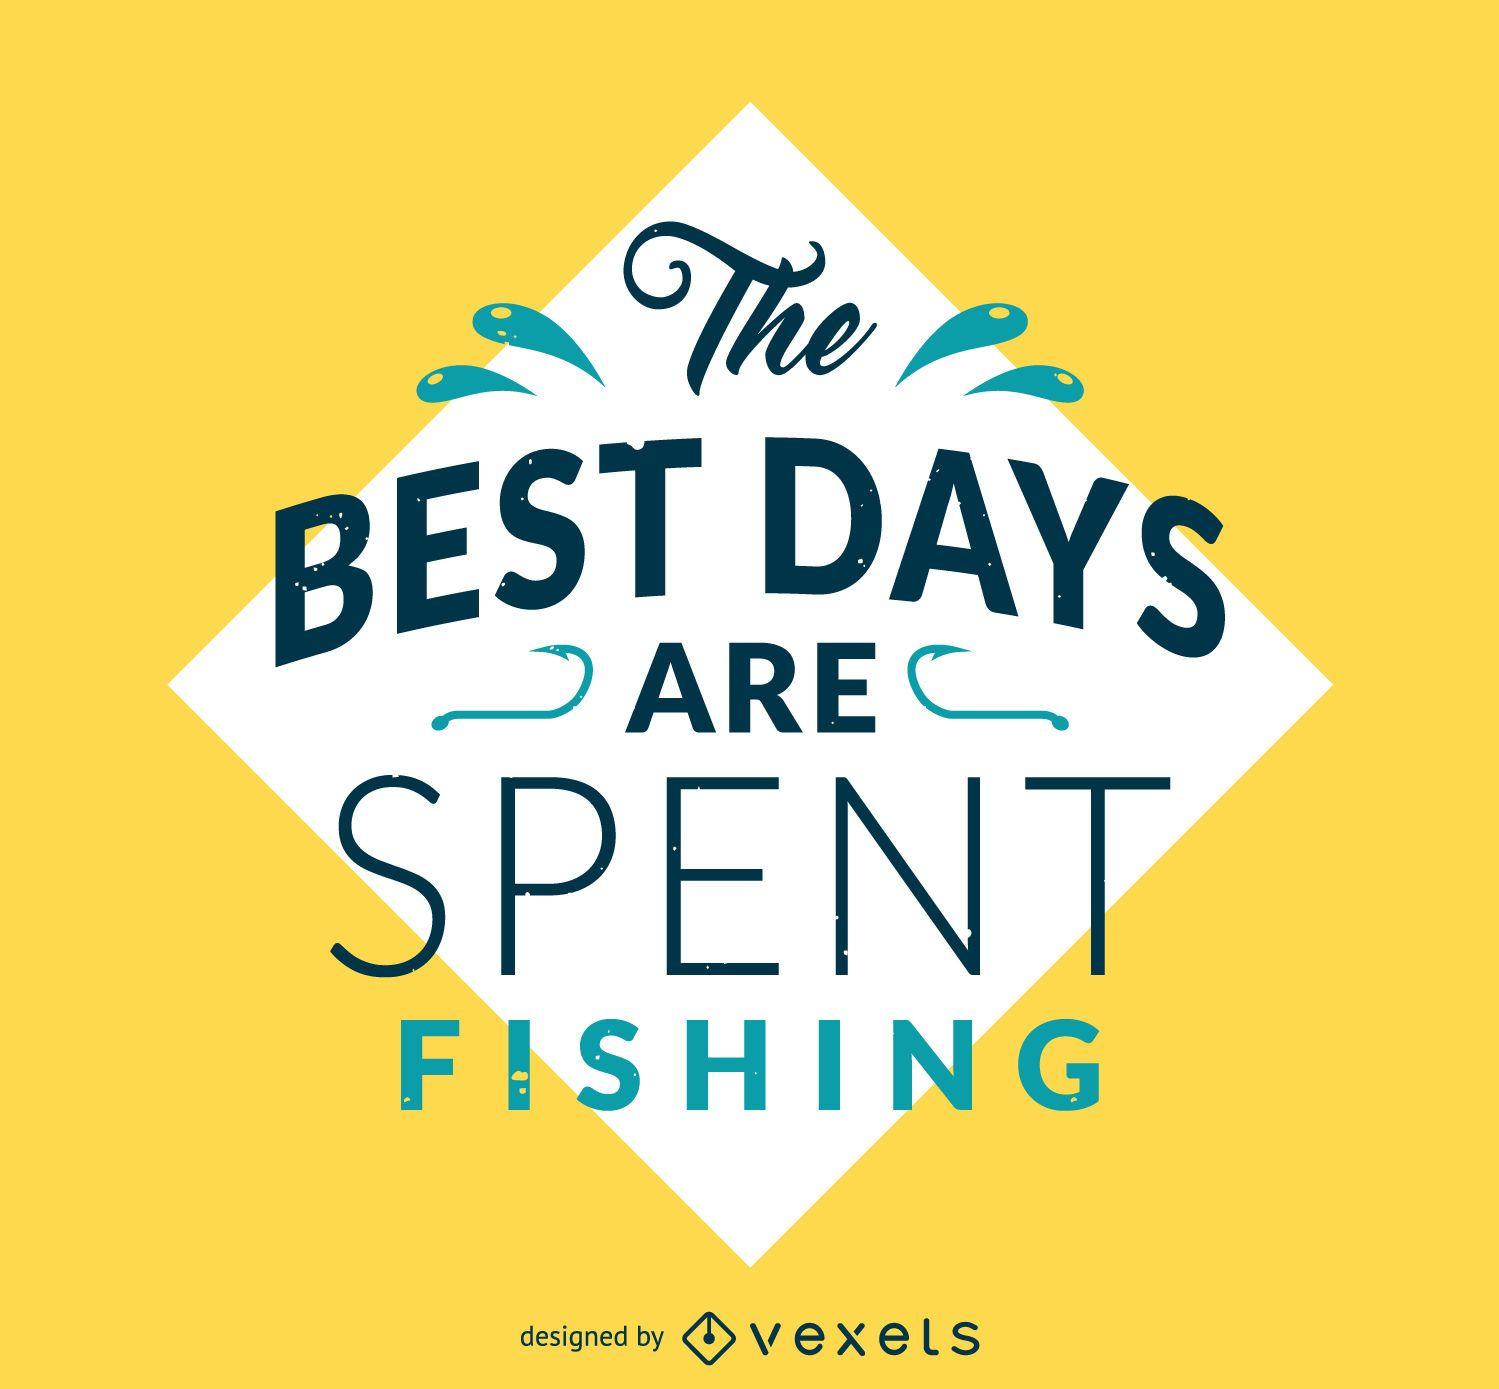 Best days spent fishing poster